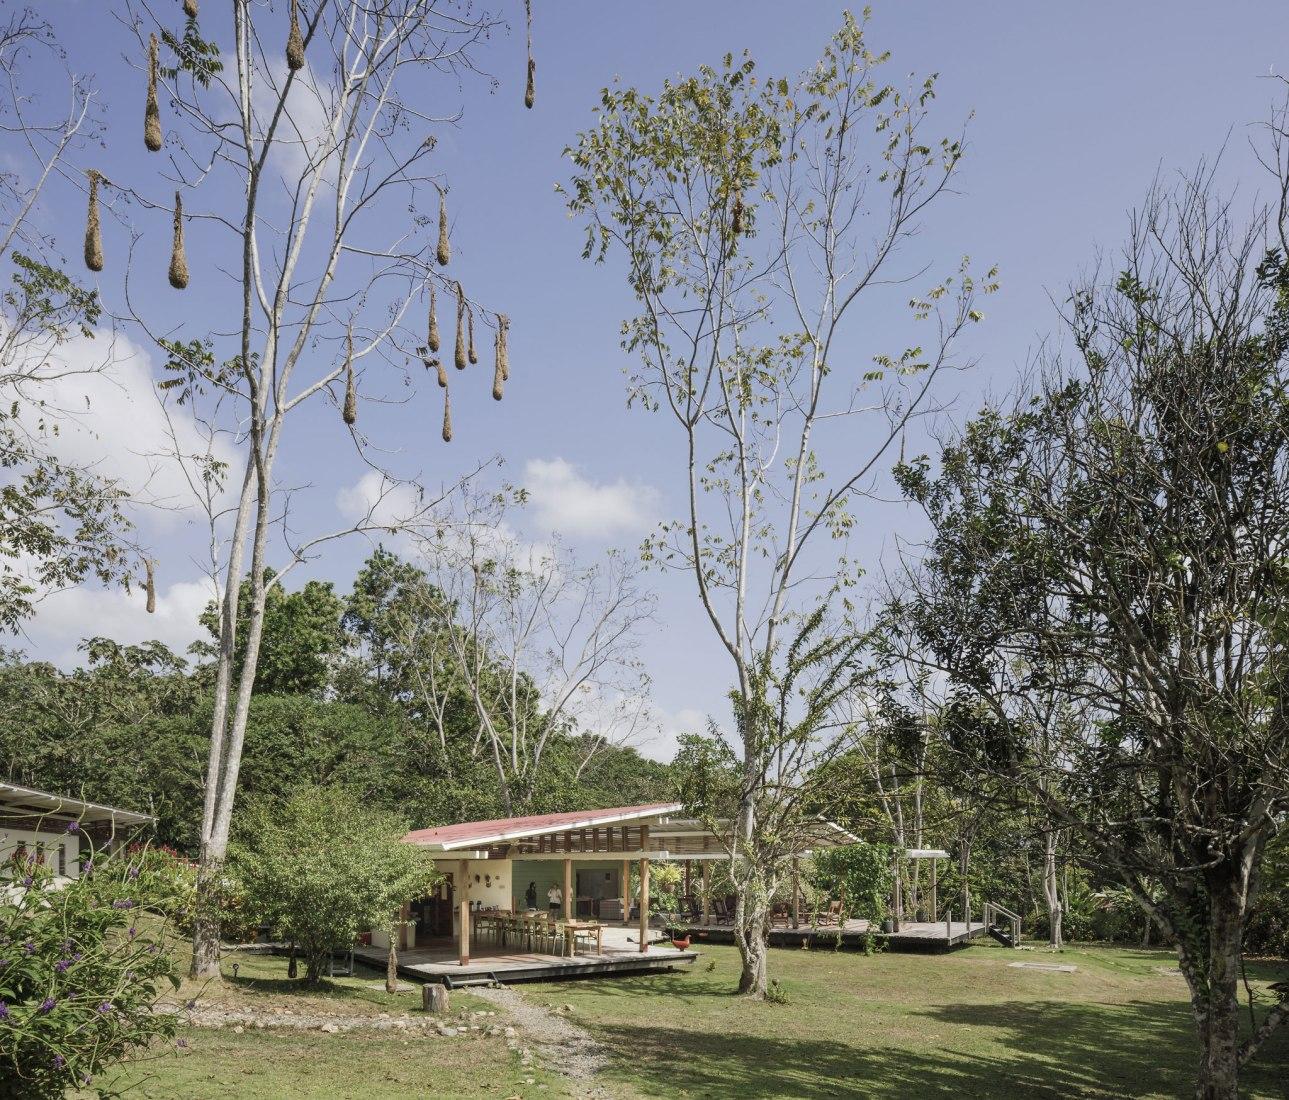 Canopy Camp Darien por Diego Cambefort + Diana Bernal. Fotografía © Fernando Aldá.